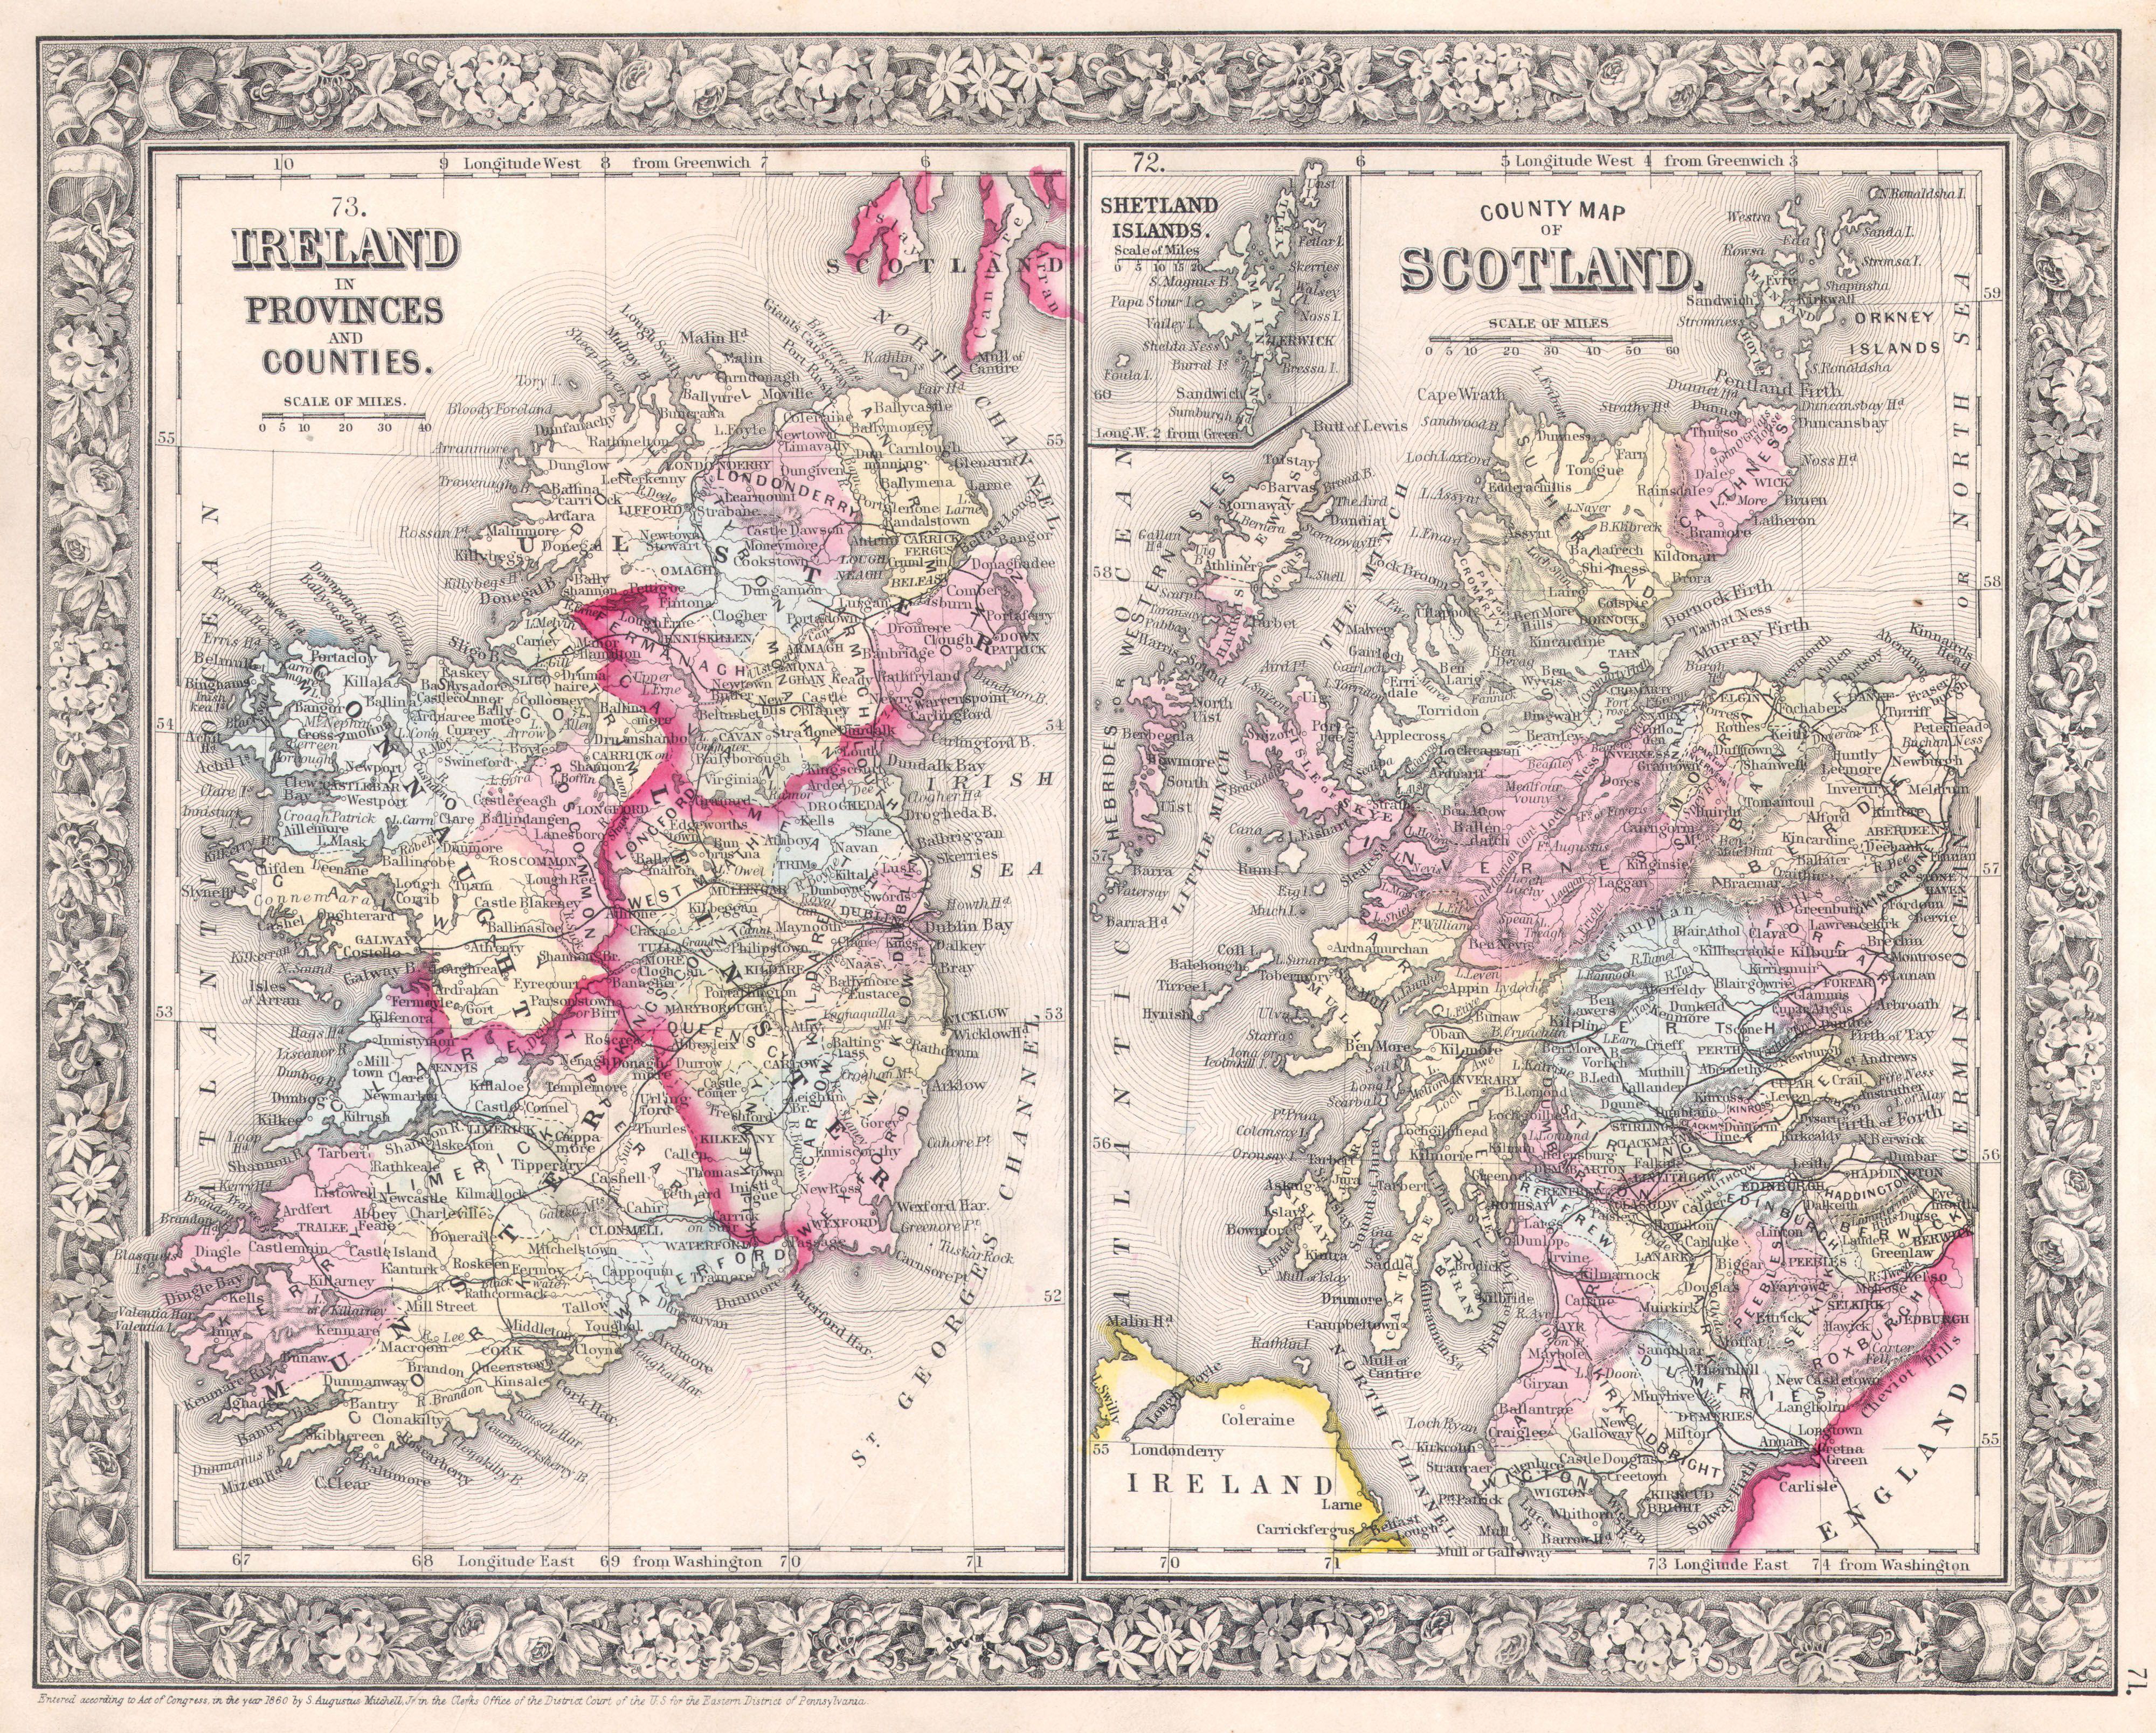 Map Of Ireland And Scotland.File 1864 Mitchell Map Of Ireland And Scotland Geographicus